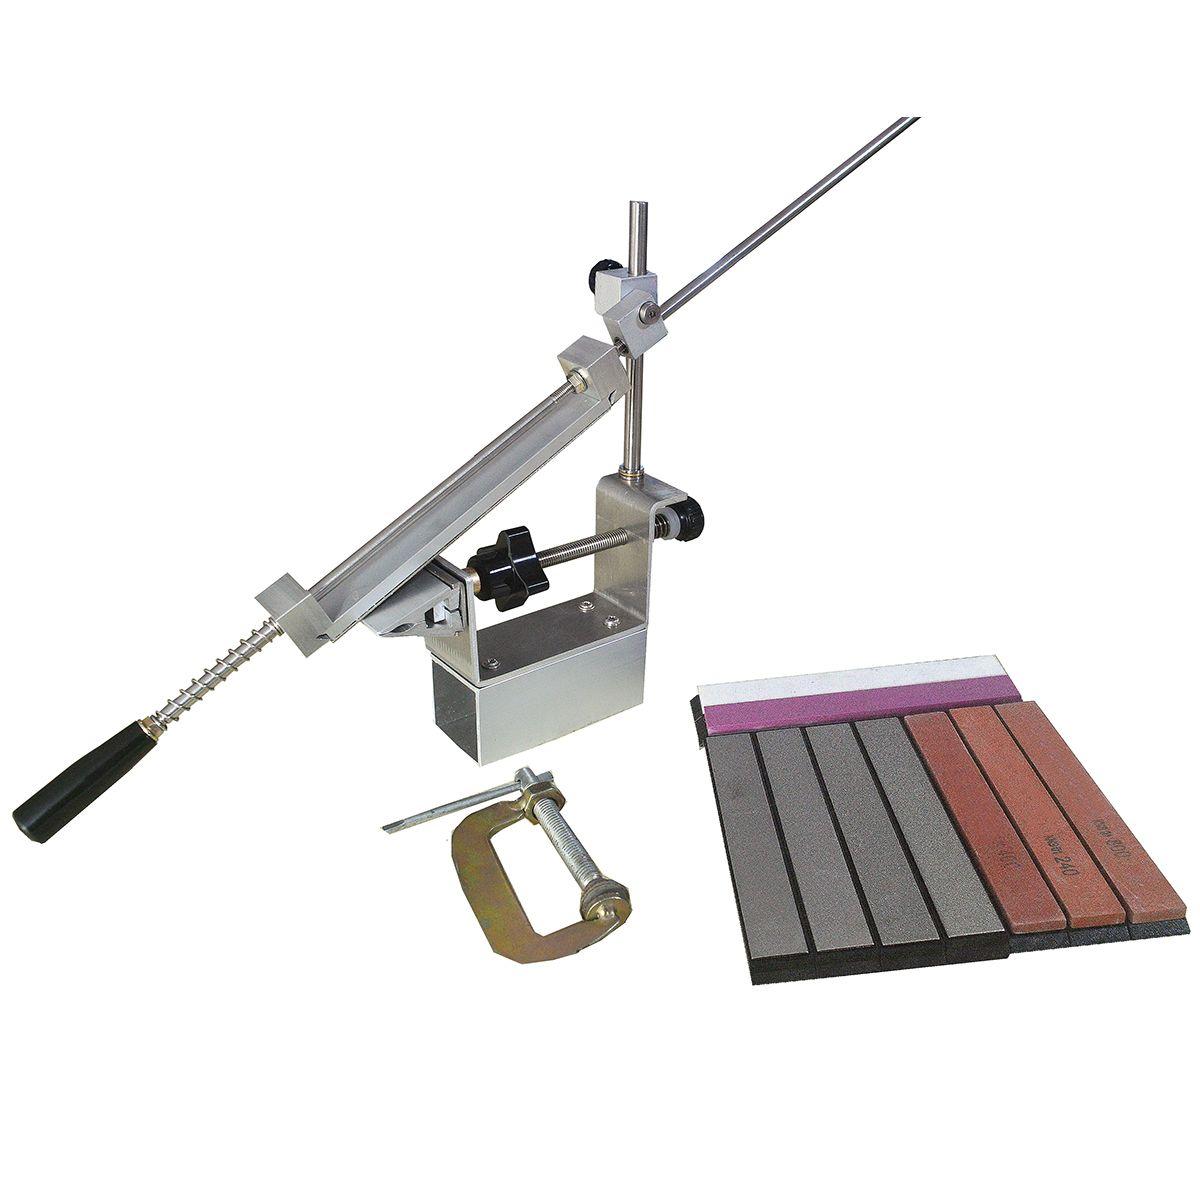 Knife Sharpener Professional Larger Degree Newest Portable 360 Degree Rotation clip Apex edge EDGE KME system 1 diamond stone